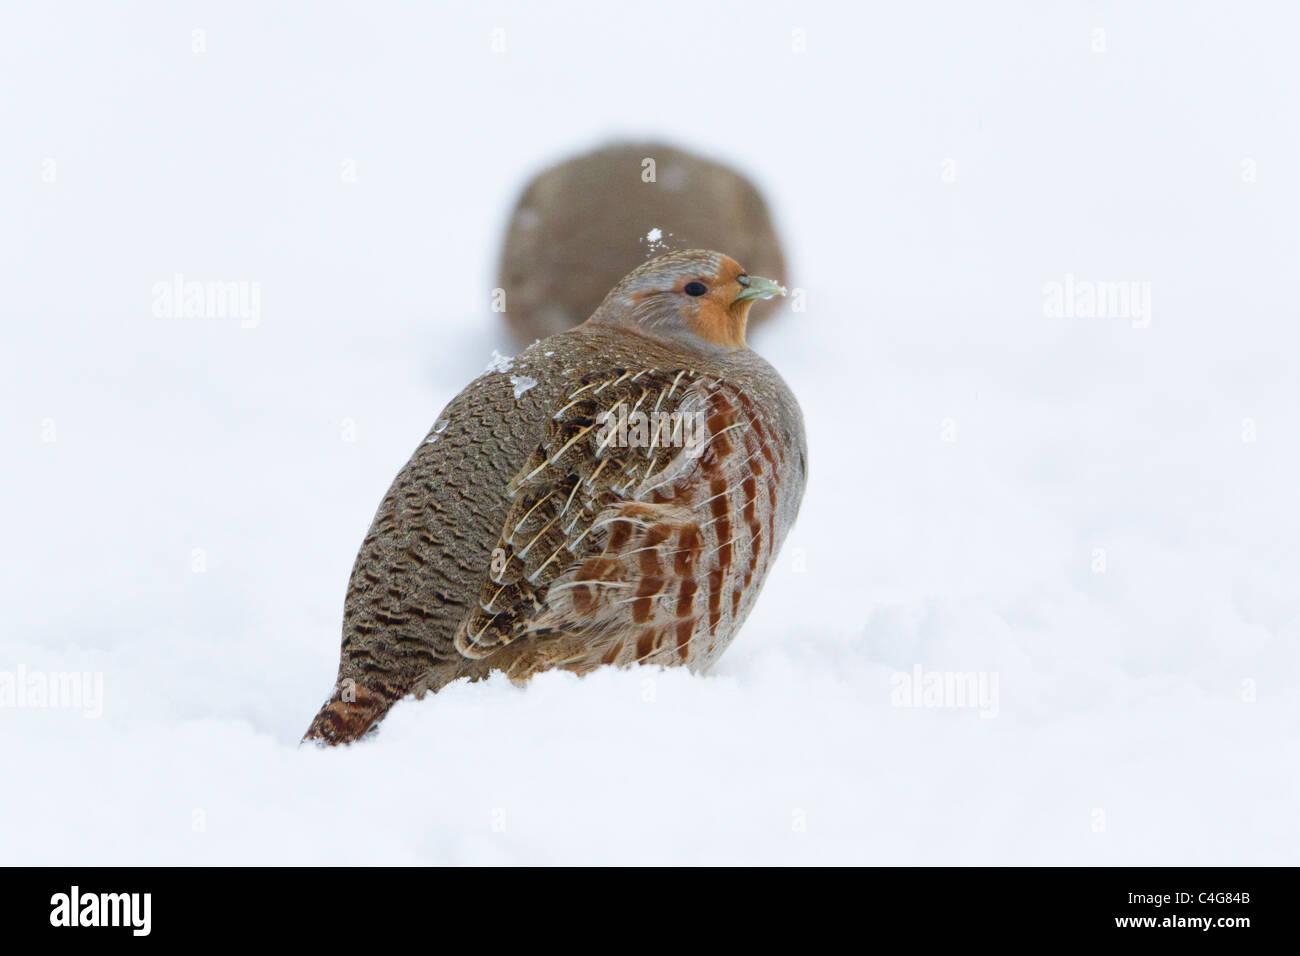 Grey Partridge (Perdix perdix), covey on snow covered field, Lower Saxony, Germany - Stock Image